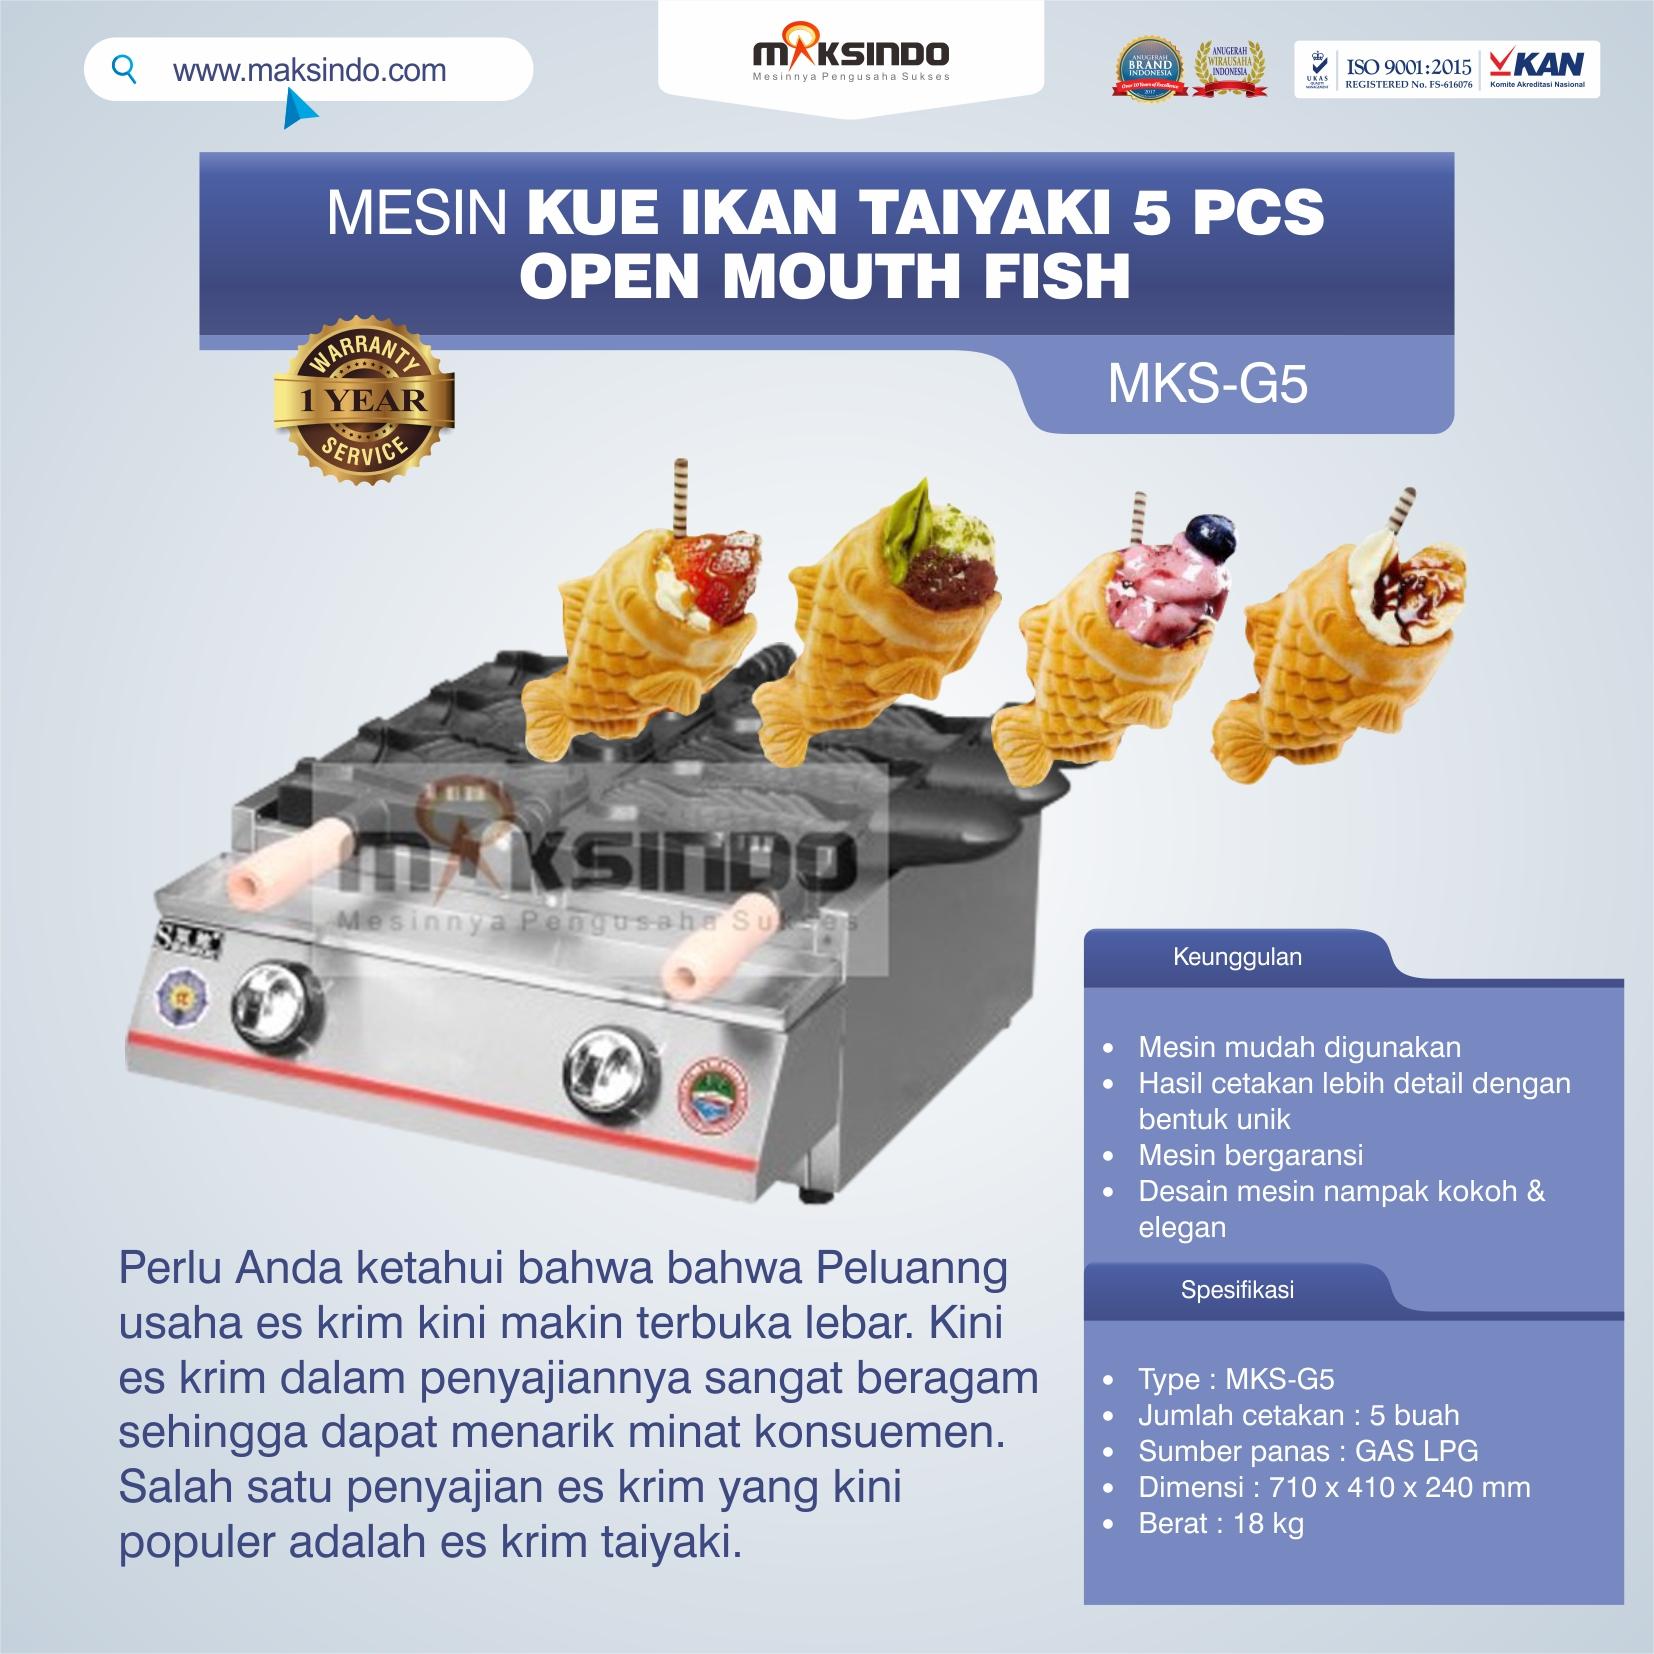 Mesin Kue Ikan Taiyaki 5 Pcs – Open Mouth Fish